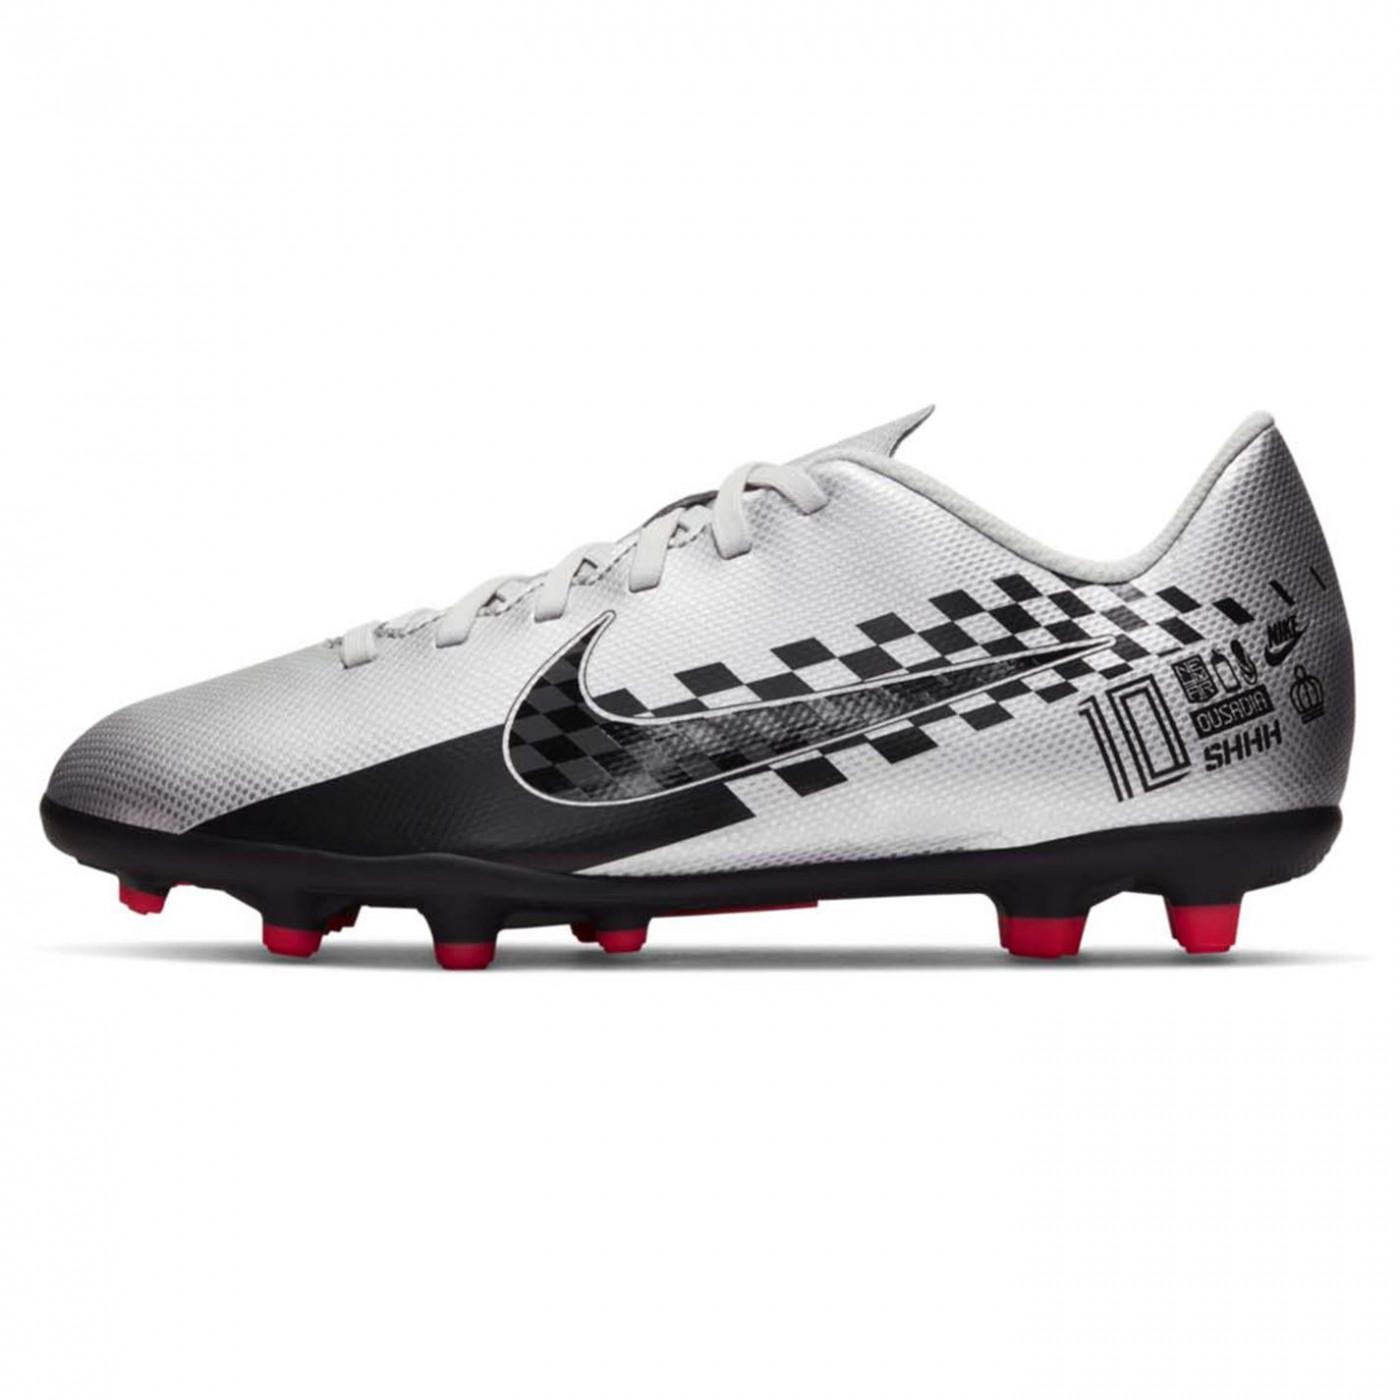 Nike Mercurial Vapor Club Neymar Jr Junior FG Football Boots